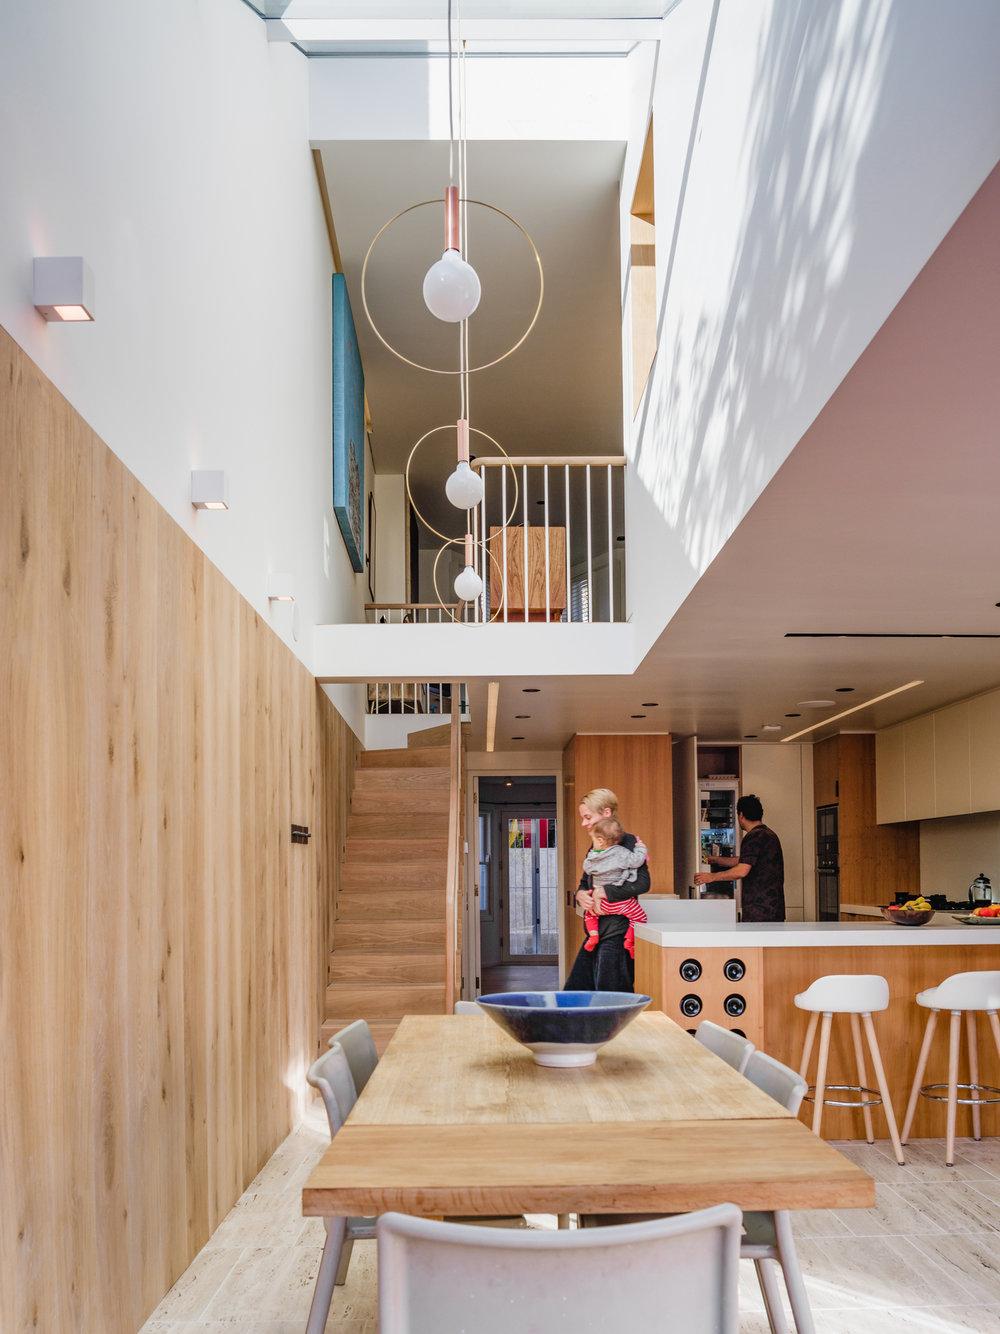 NLA Shortlist Project Dusheiko House by Neil Dusheiko Architects